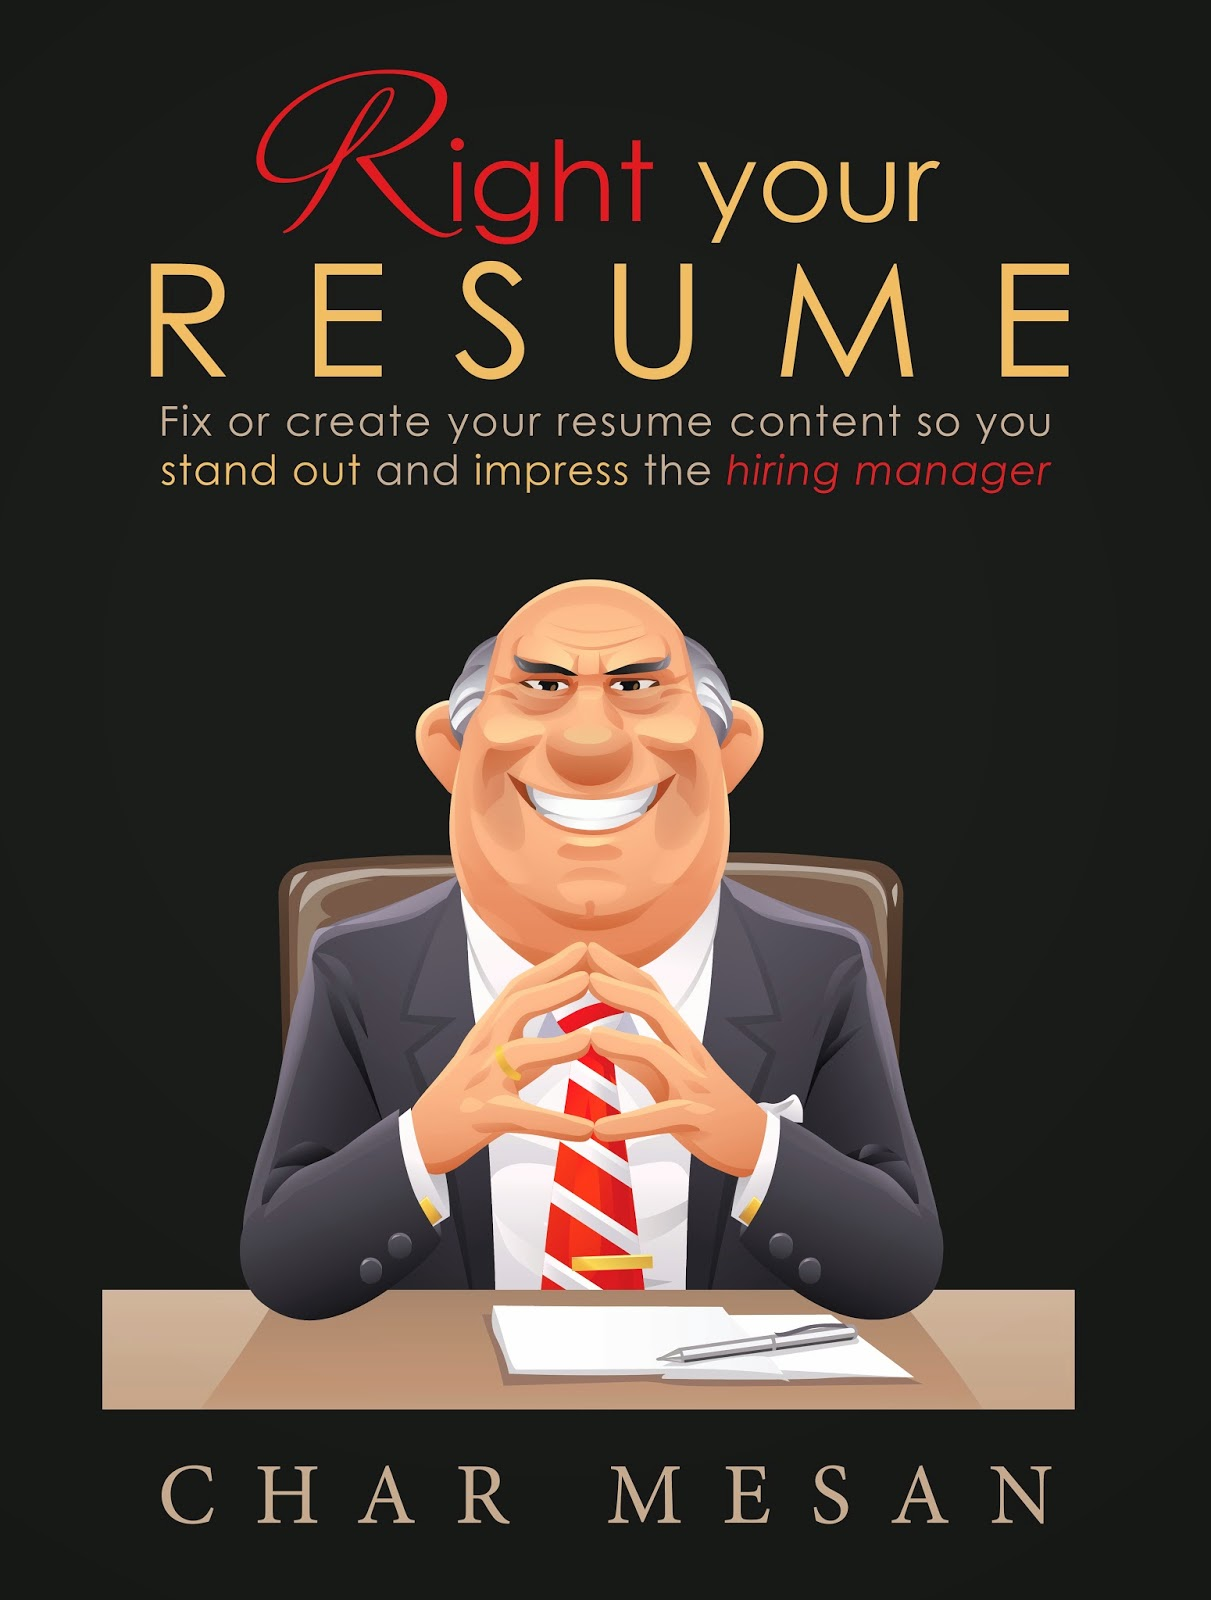 "<a href=""http://www.amazon.com/gp/offer-listing/B00PVA6QQQ/ref=as_li_tl?ie=UTF8&camp=1789&creative=9325&creativeASIN=B00PVA6QQQ&linkCode=am2&tag=chameswri-20&linkId=BHBD3JFAQ22NQ4ZS"">Right Your Resume: Fix or create your resume content so you stand out and impress the Hiring Manager</a><img src=""http://ir-na.amazon-adsystem.com/e/ir?t=chameswri-20&l=am2&o=1&a=B00PVA6QQQ"" width=""1"" height=""1"" border=""0"" alt="""" style=""border:none !important; margin:0px !important;"" />"